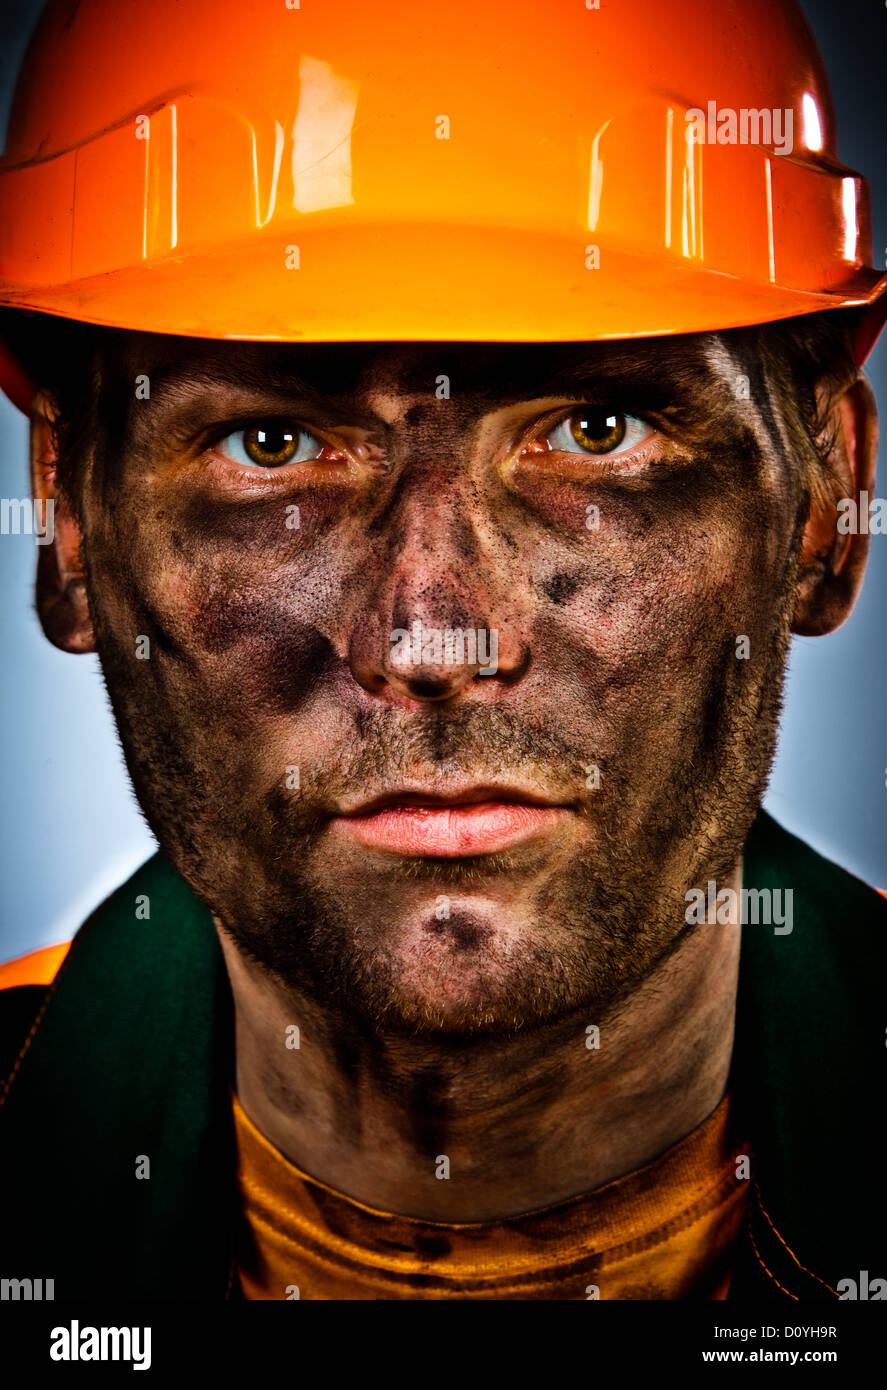 Portrait Öl Industrie Arbeiter Stockbild